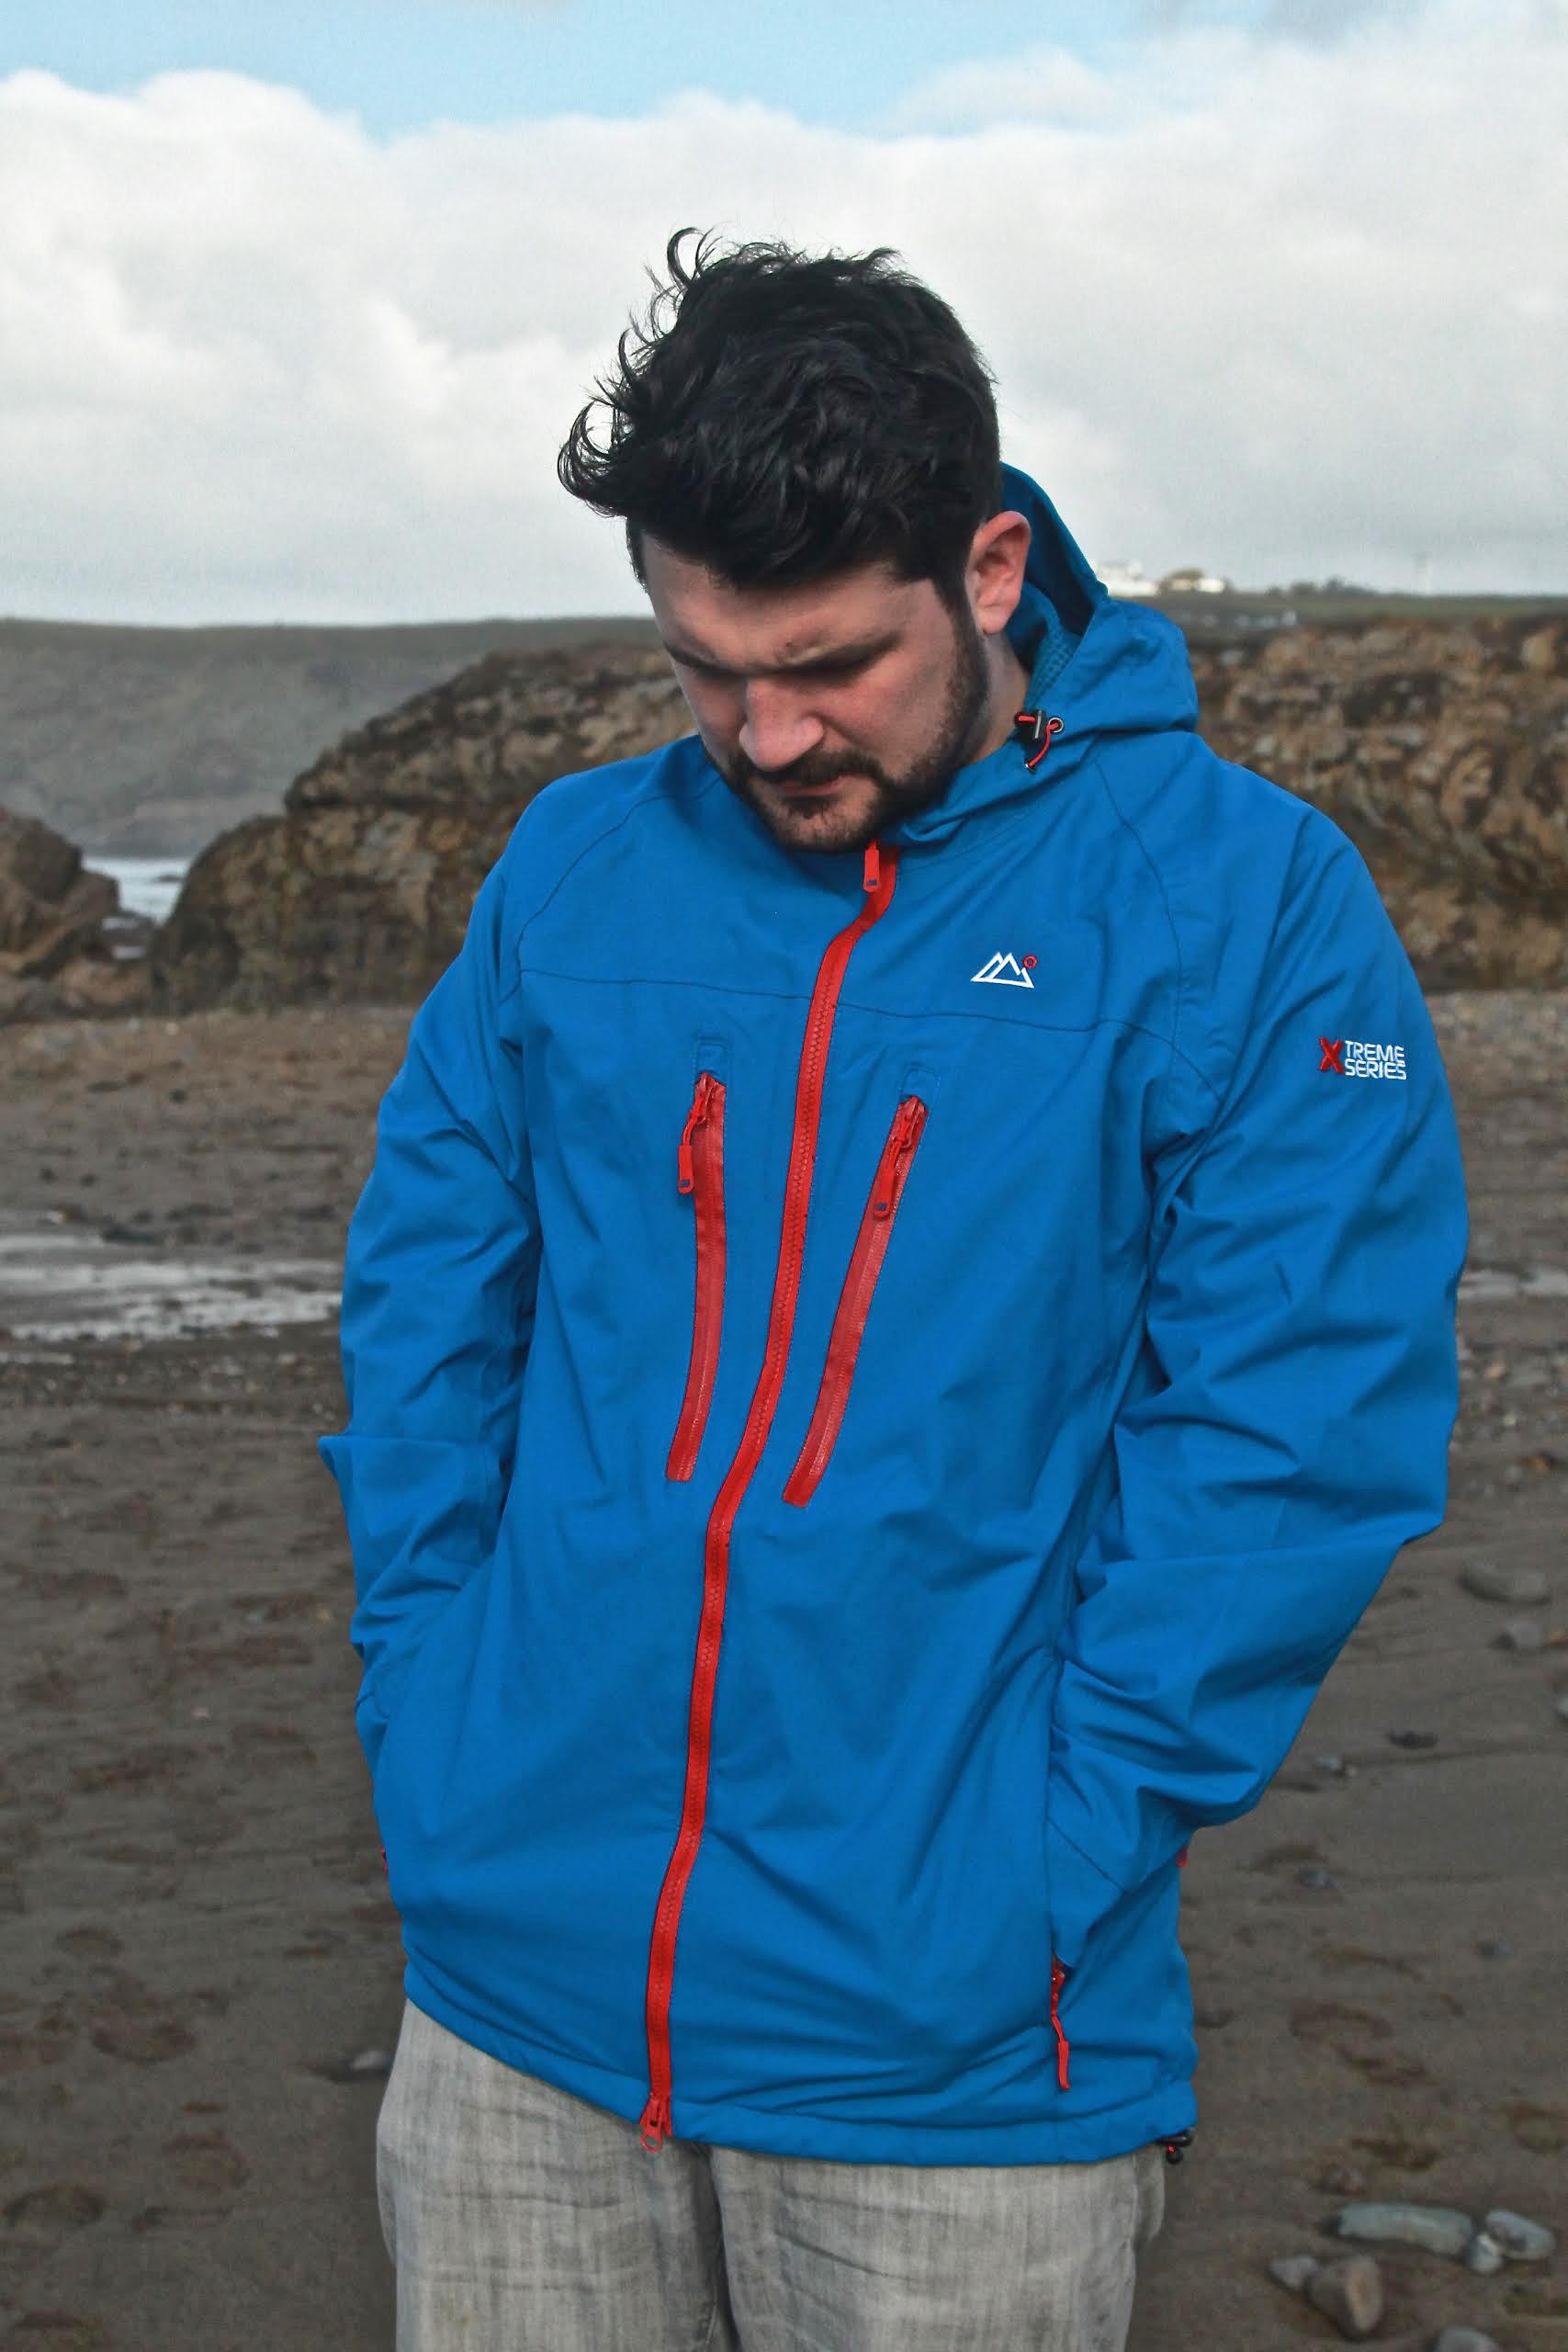 Target Dry Extreme men's jacket